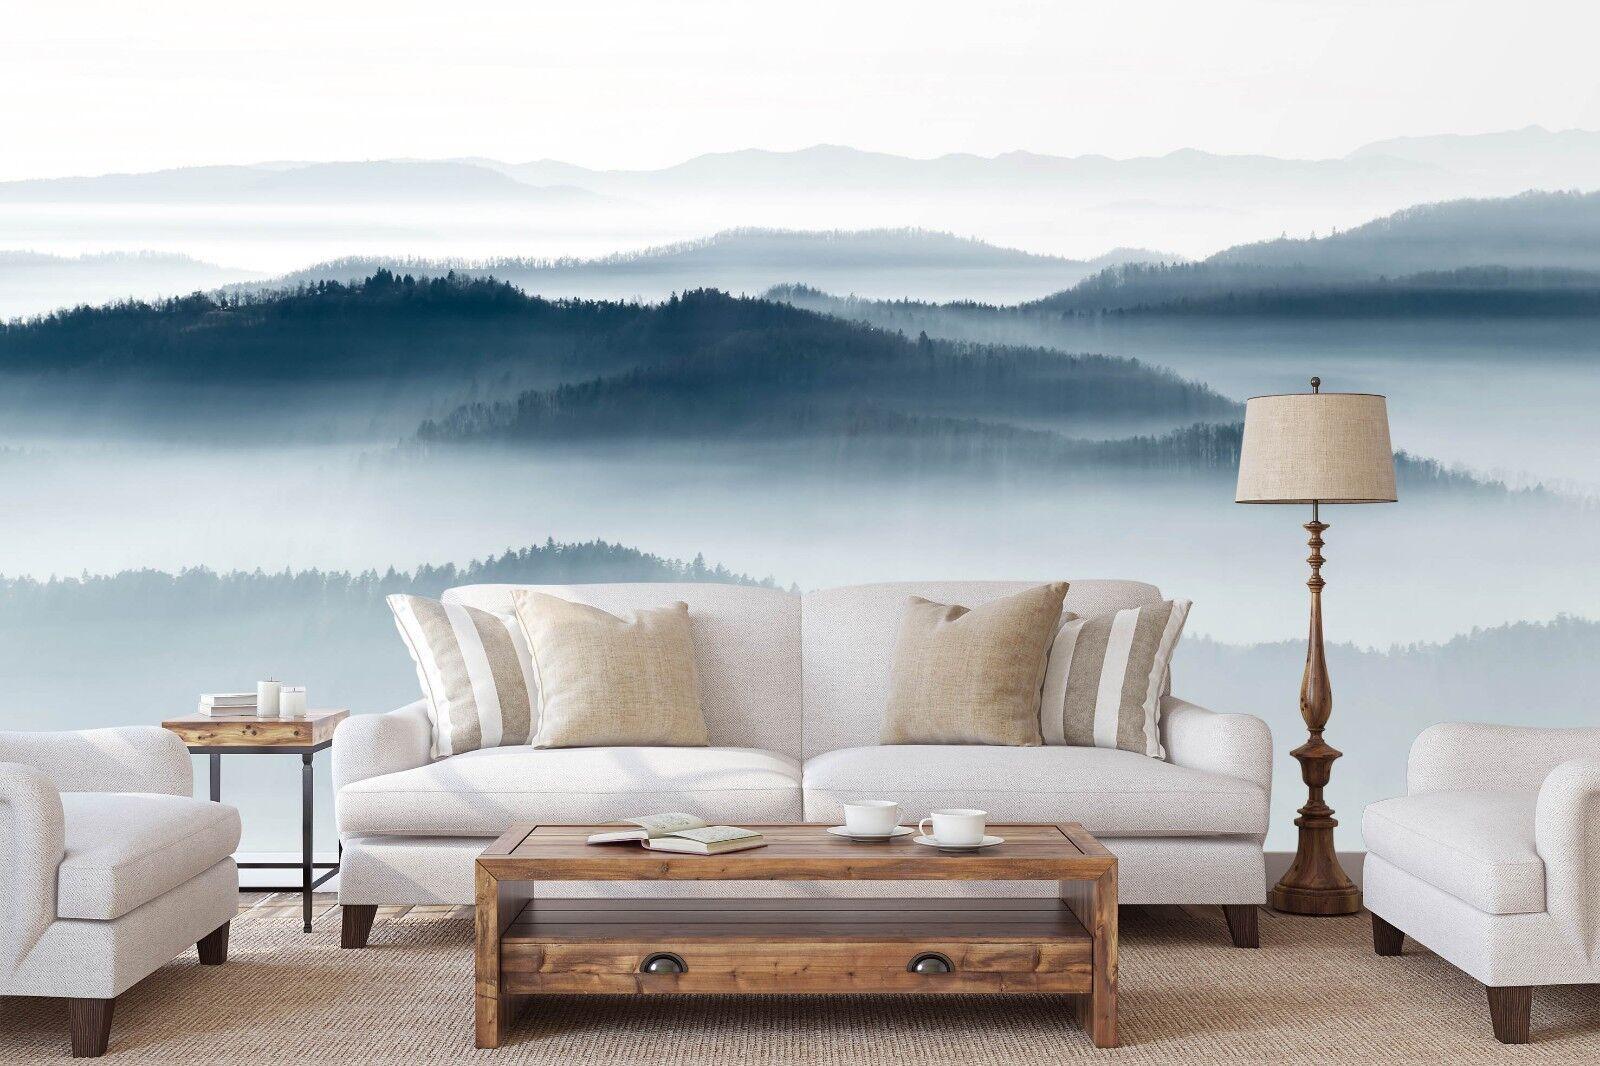 3D Berge Wolken 885 Tapete Wandgemälde Tapete Tapeten Bild Familie DE Sidney | Mittel Preis  | Professionelles Design  |